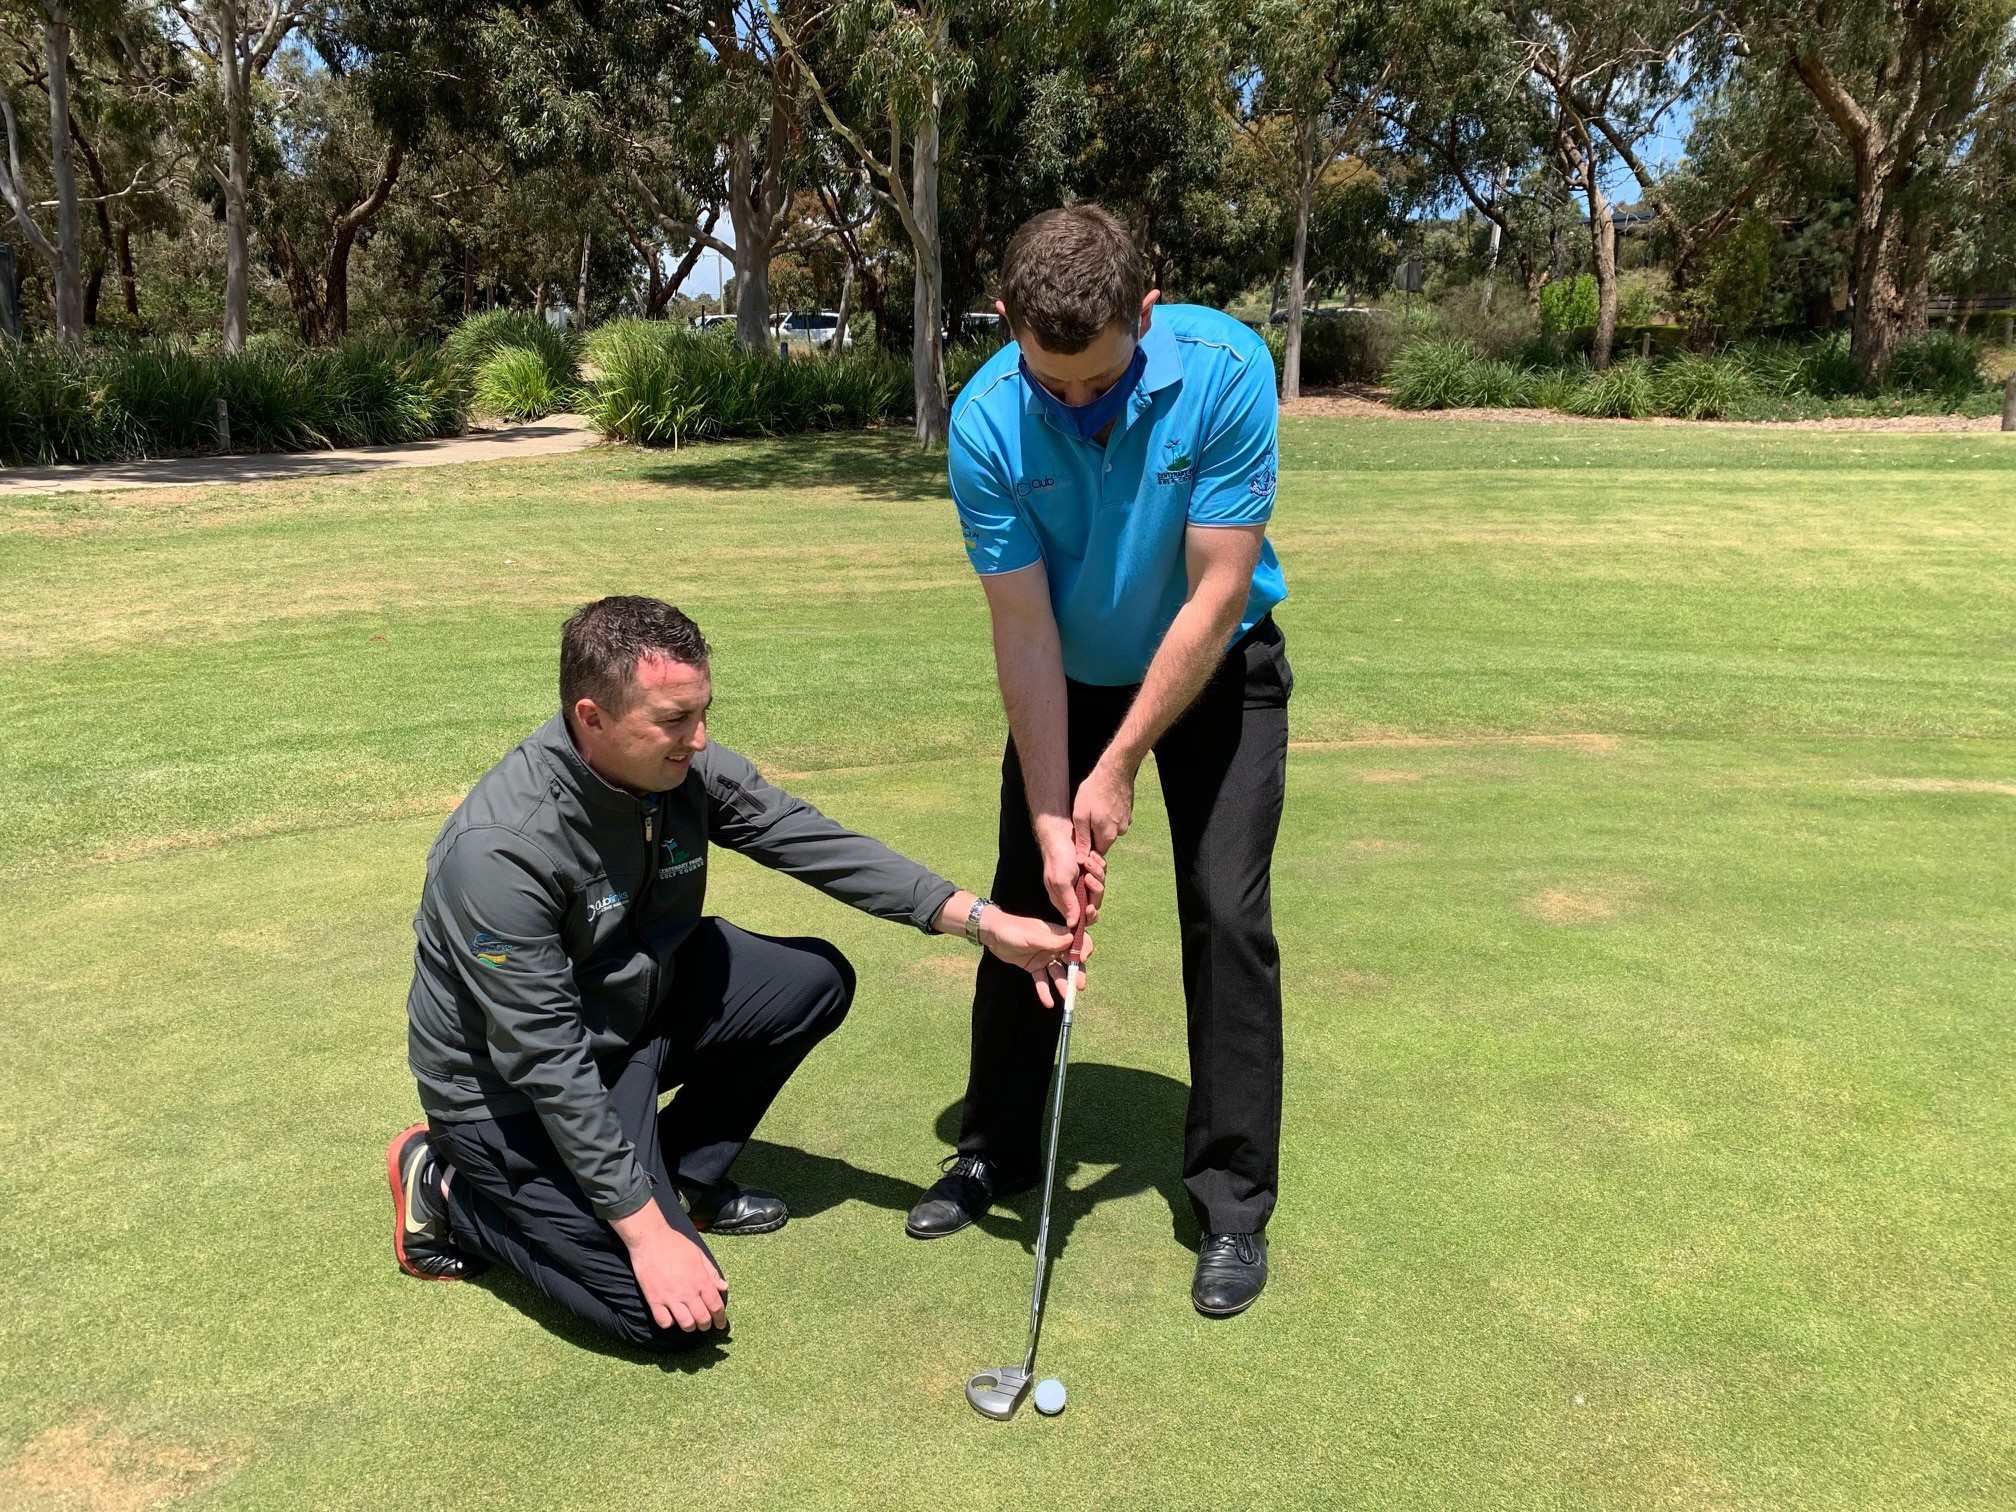 PGA Pro Putting tips